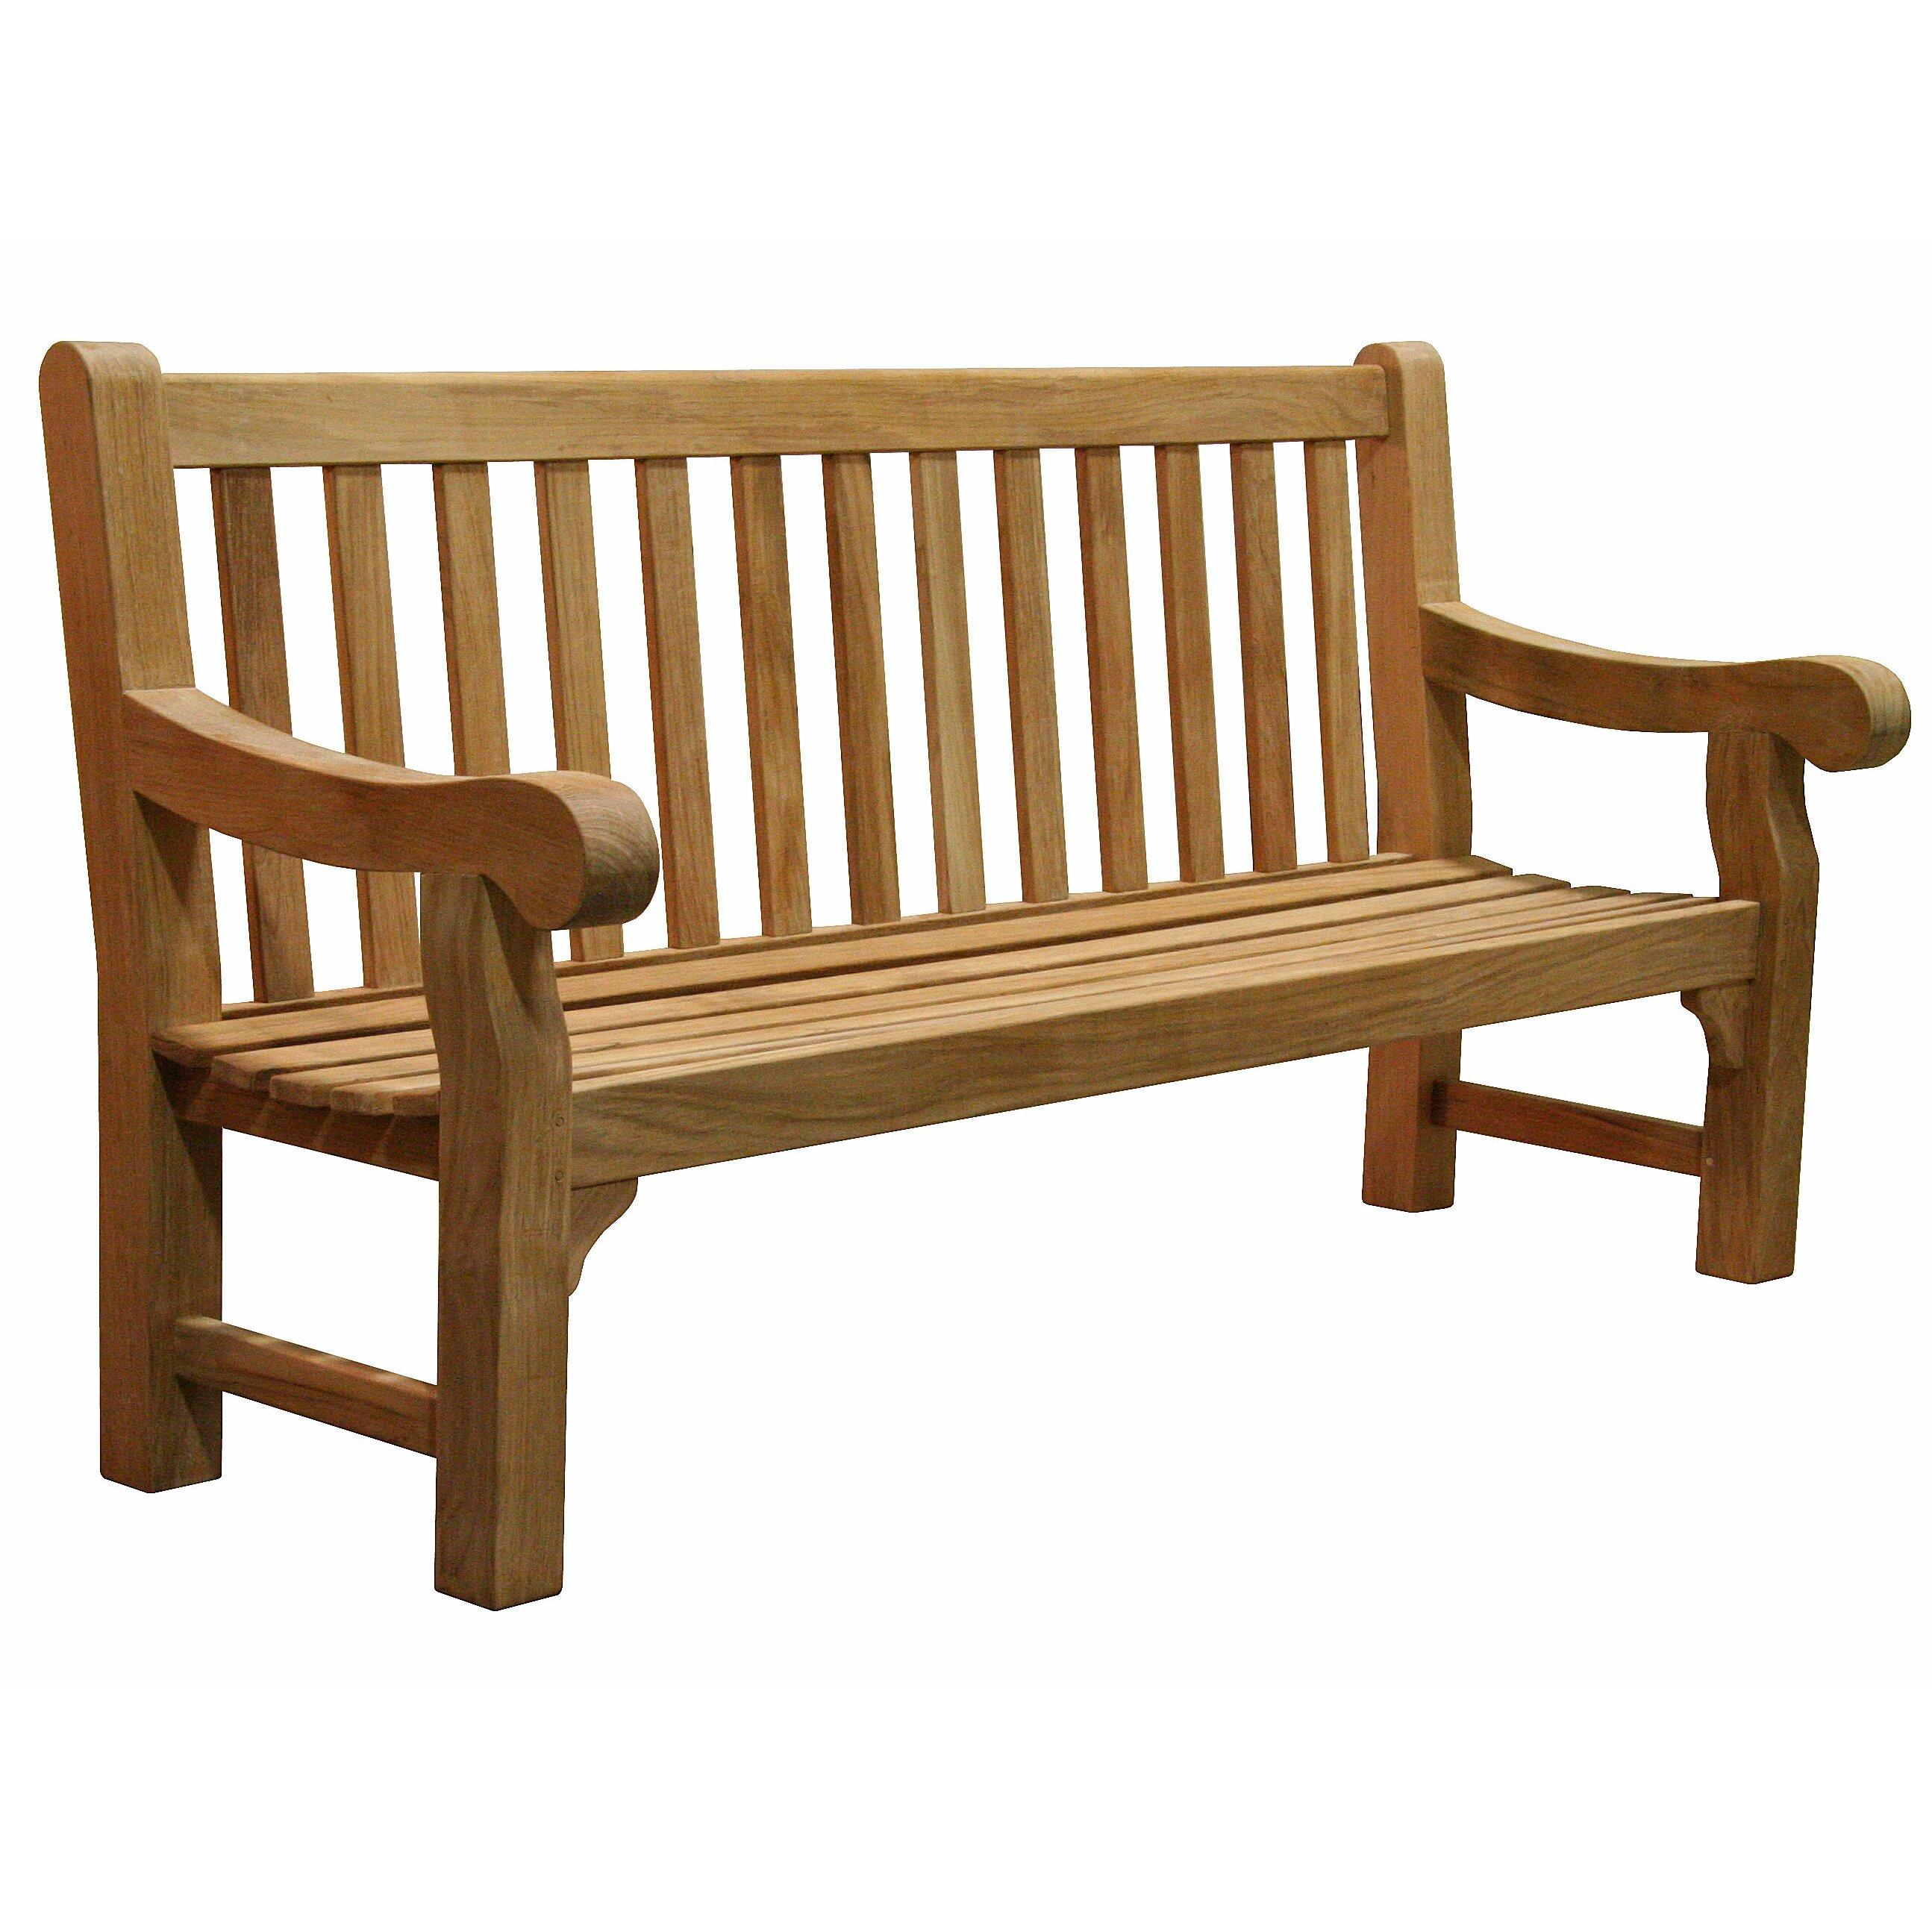 Wood Park Bench Crowdbuild For